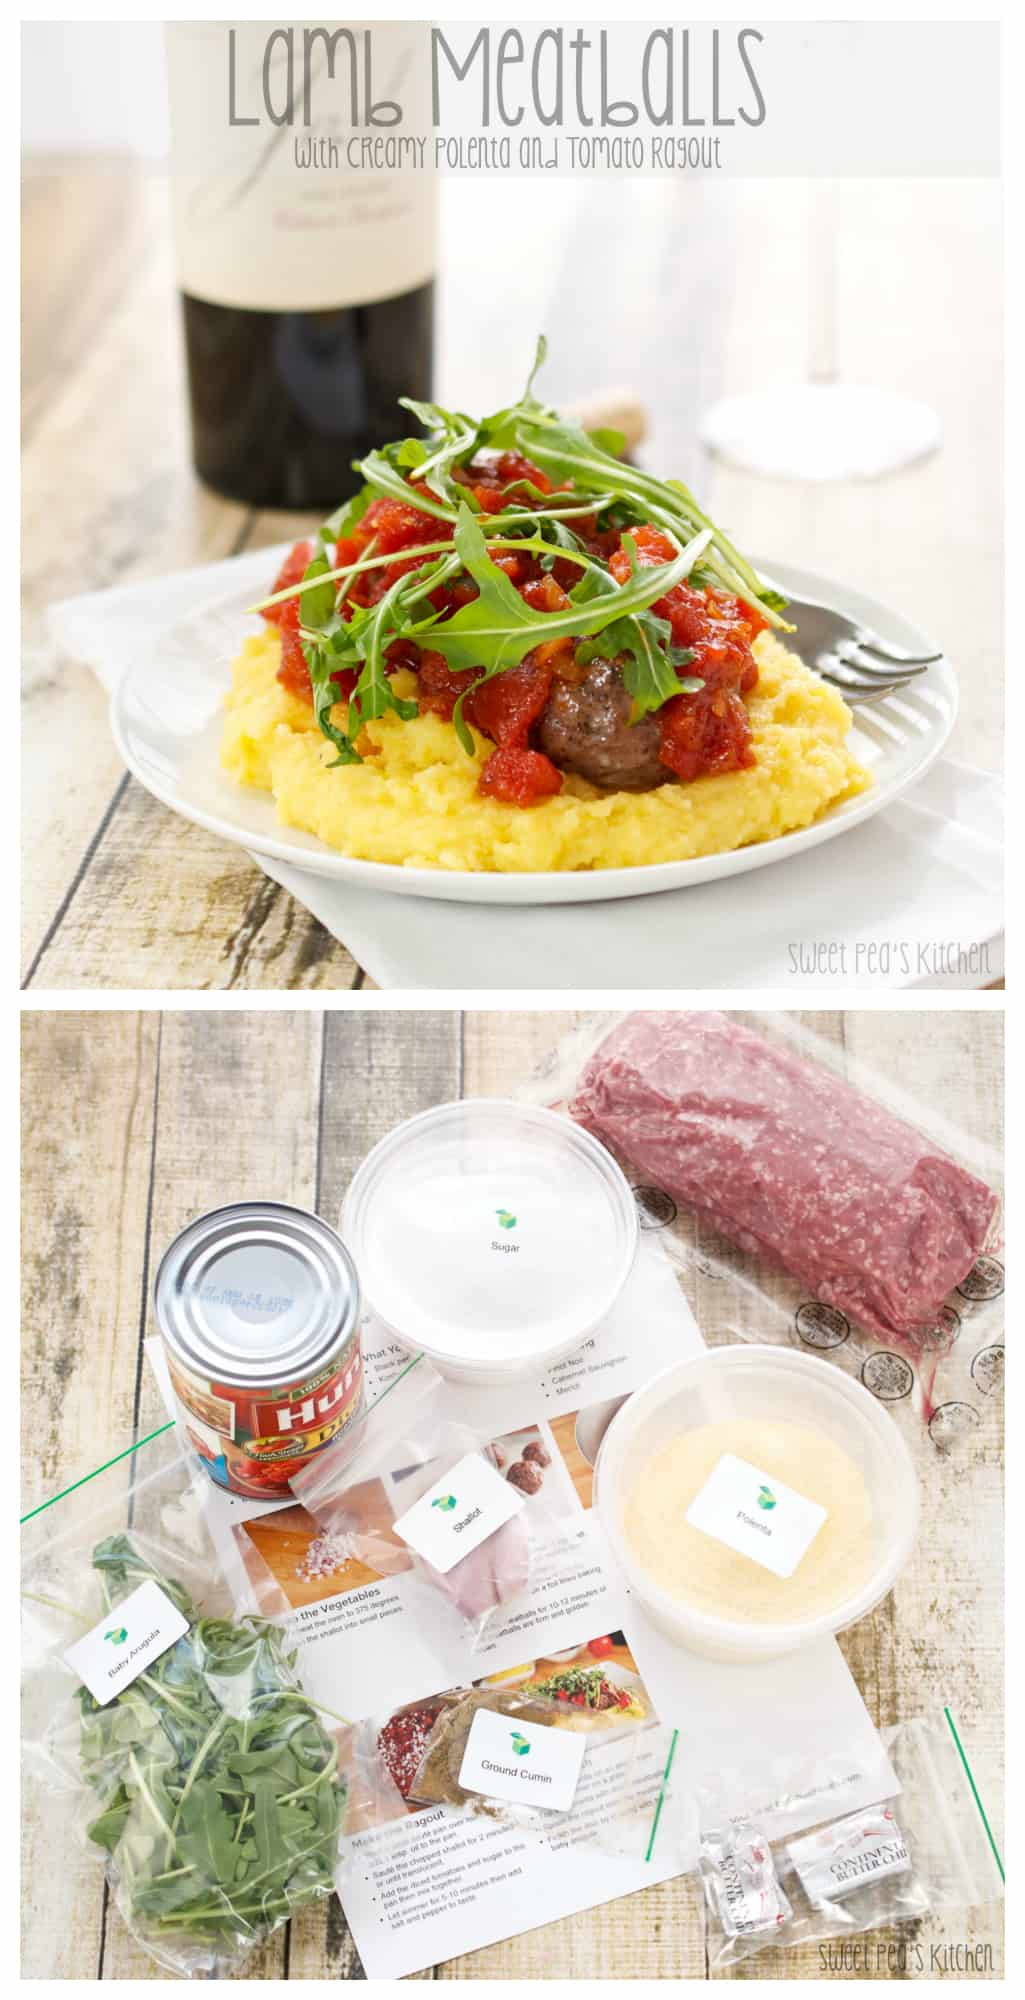 lamb meatballs images for pinterest